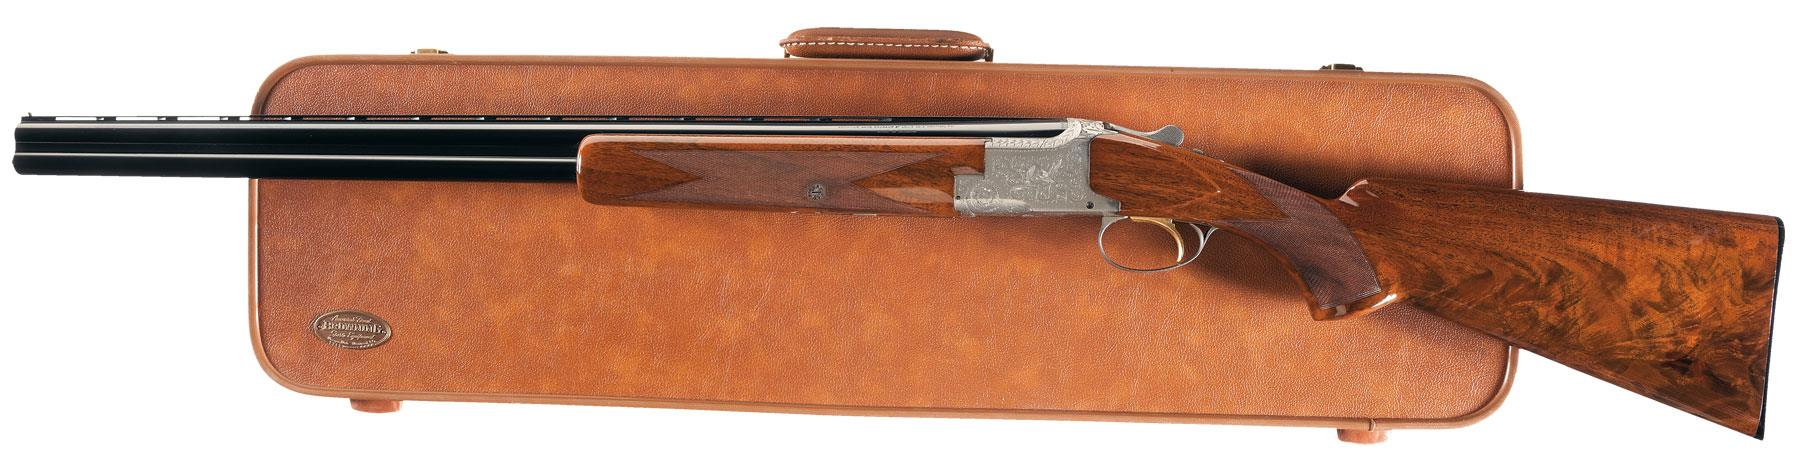 Belgian Browning Superposed Pigeon Grade 20 Gauge Shotgun with C